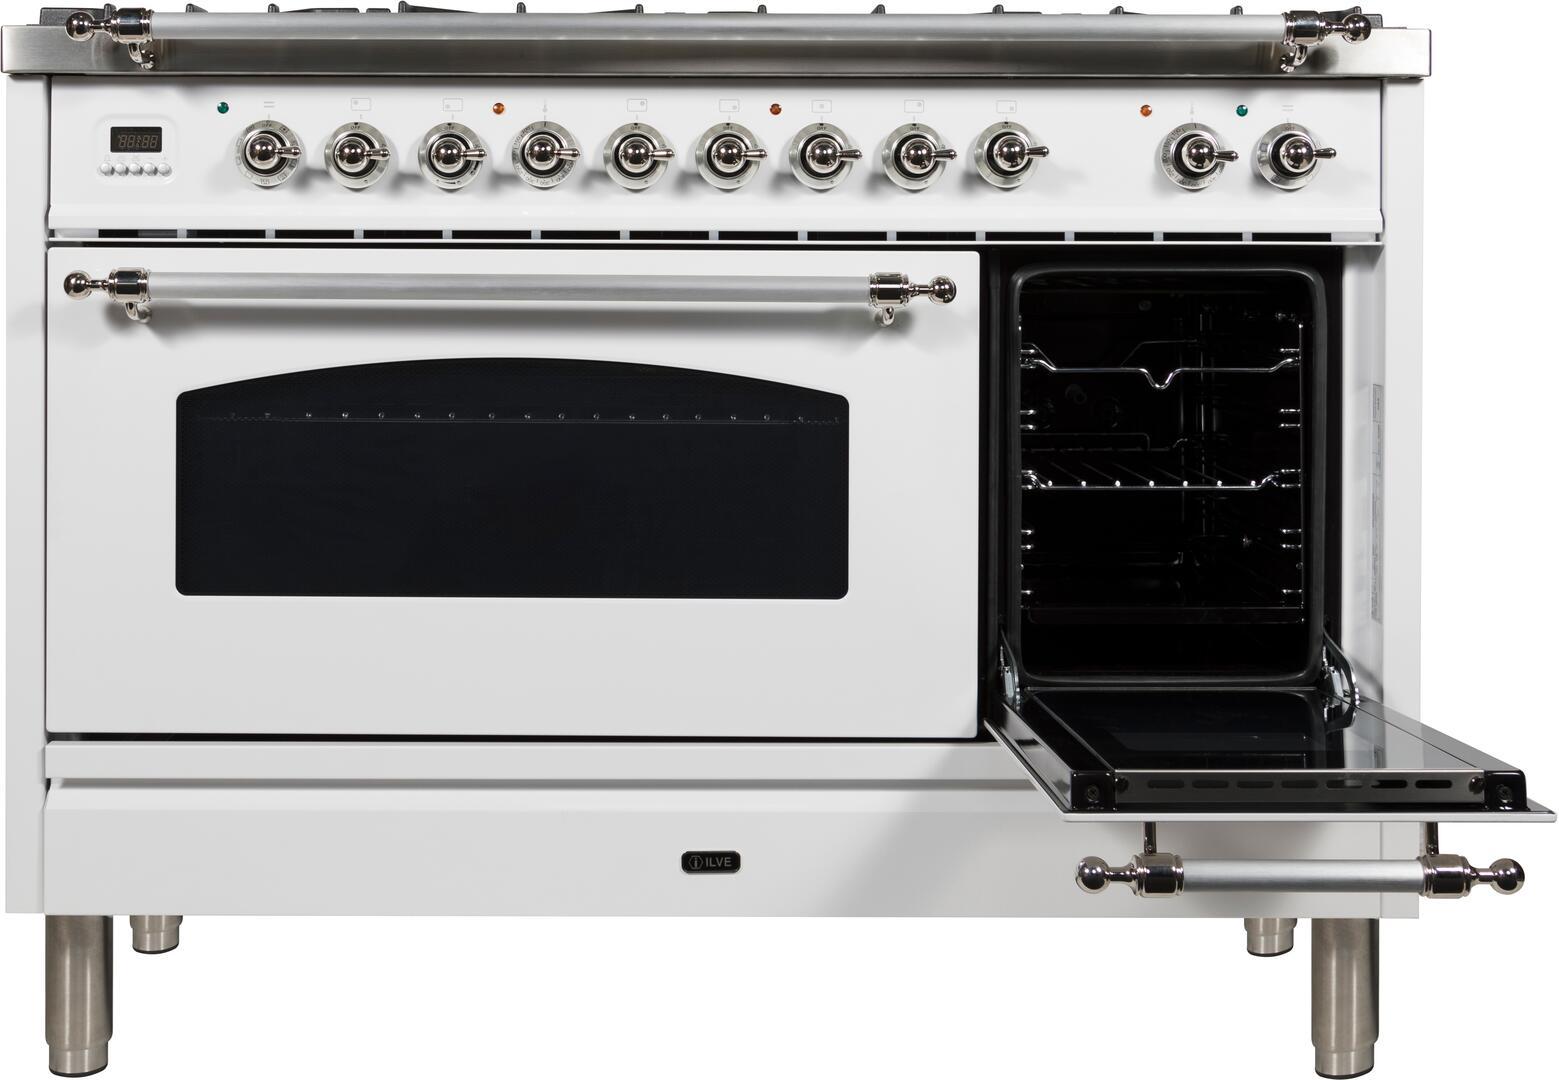 Ilve Nostalgie UPN120FDMPBXLP Freestanding Dual Fuel Range White, ILVE UPN120FDMP Range Door2 Open